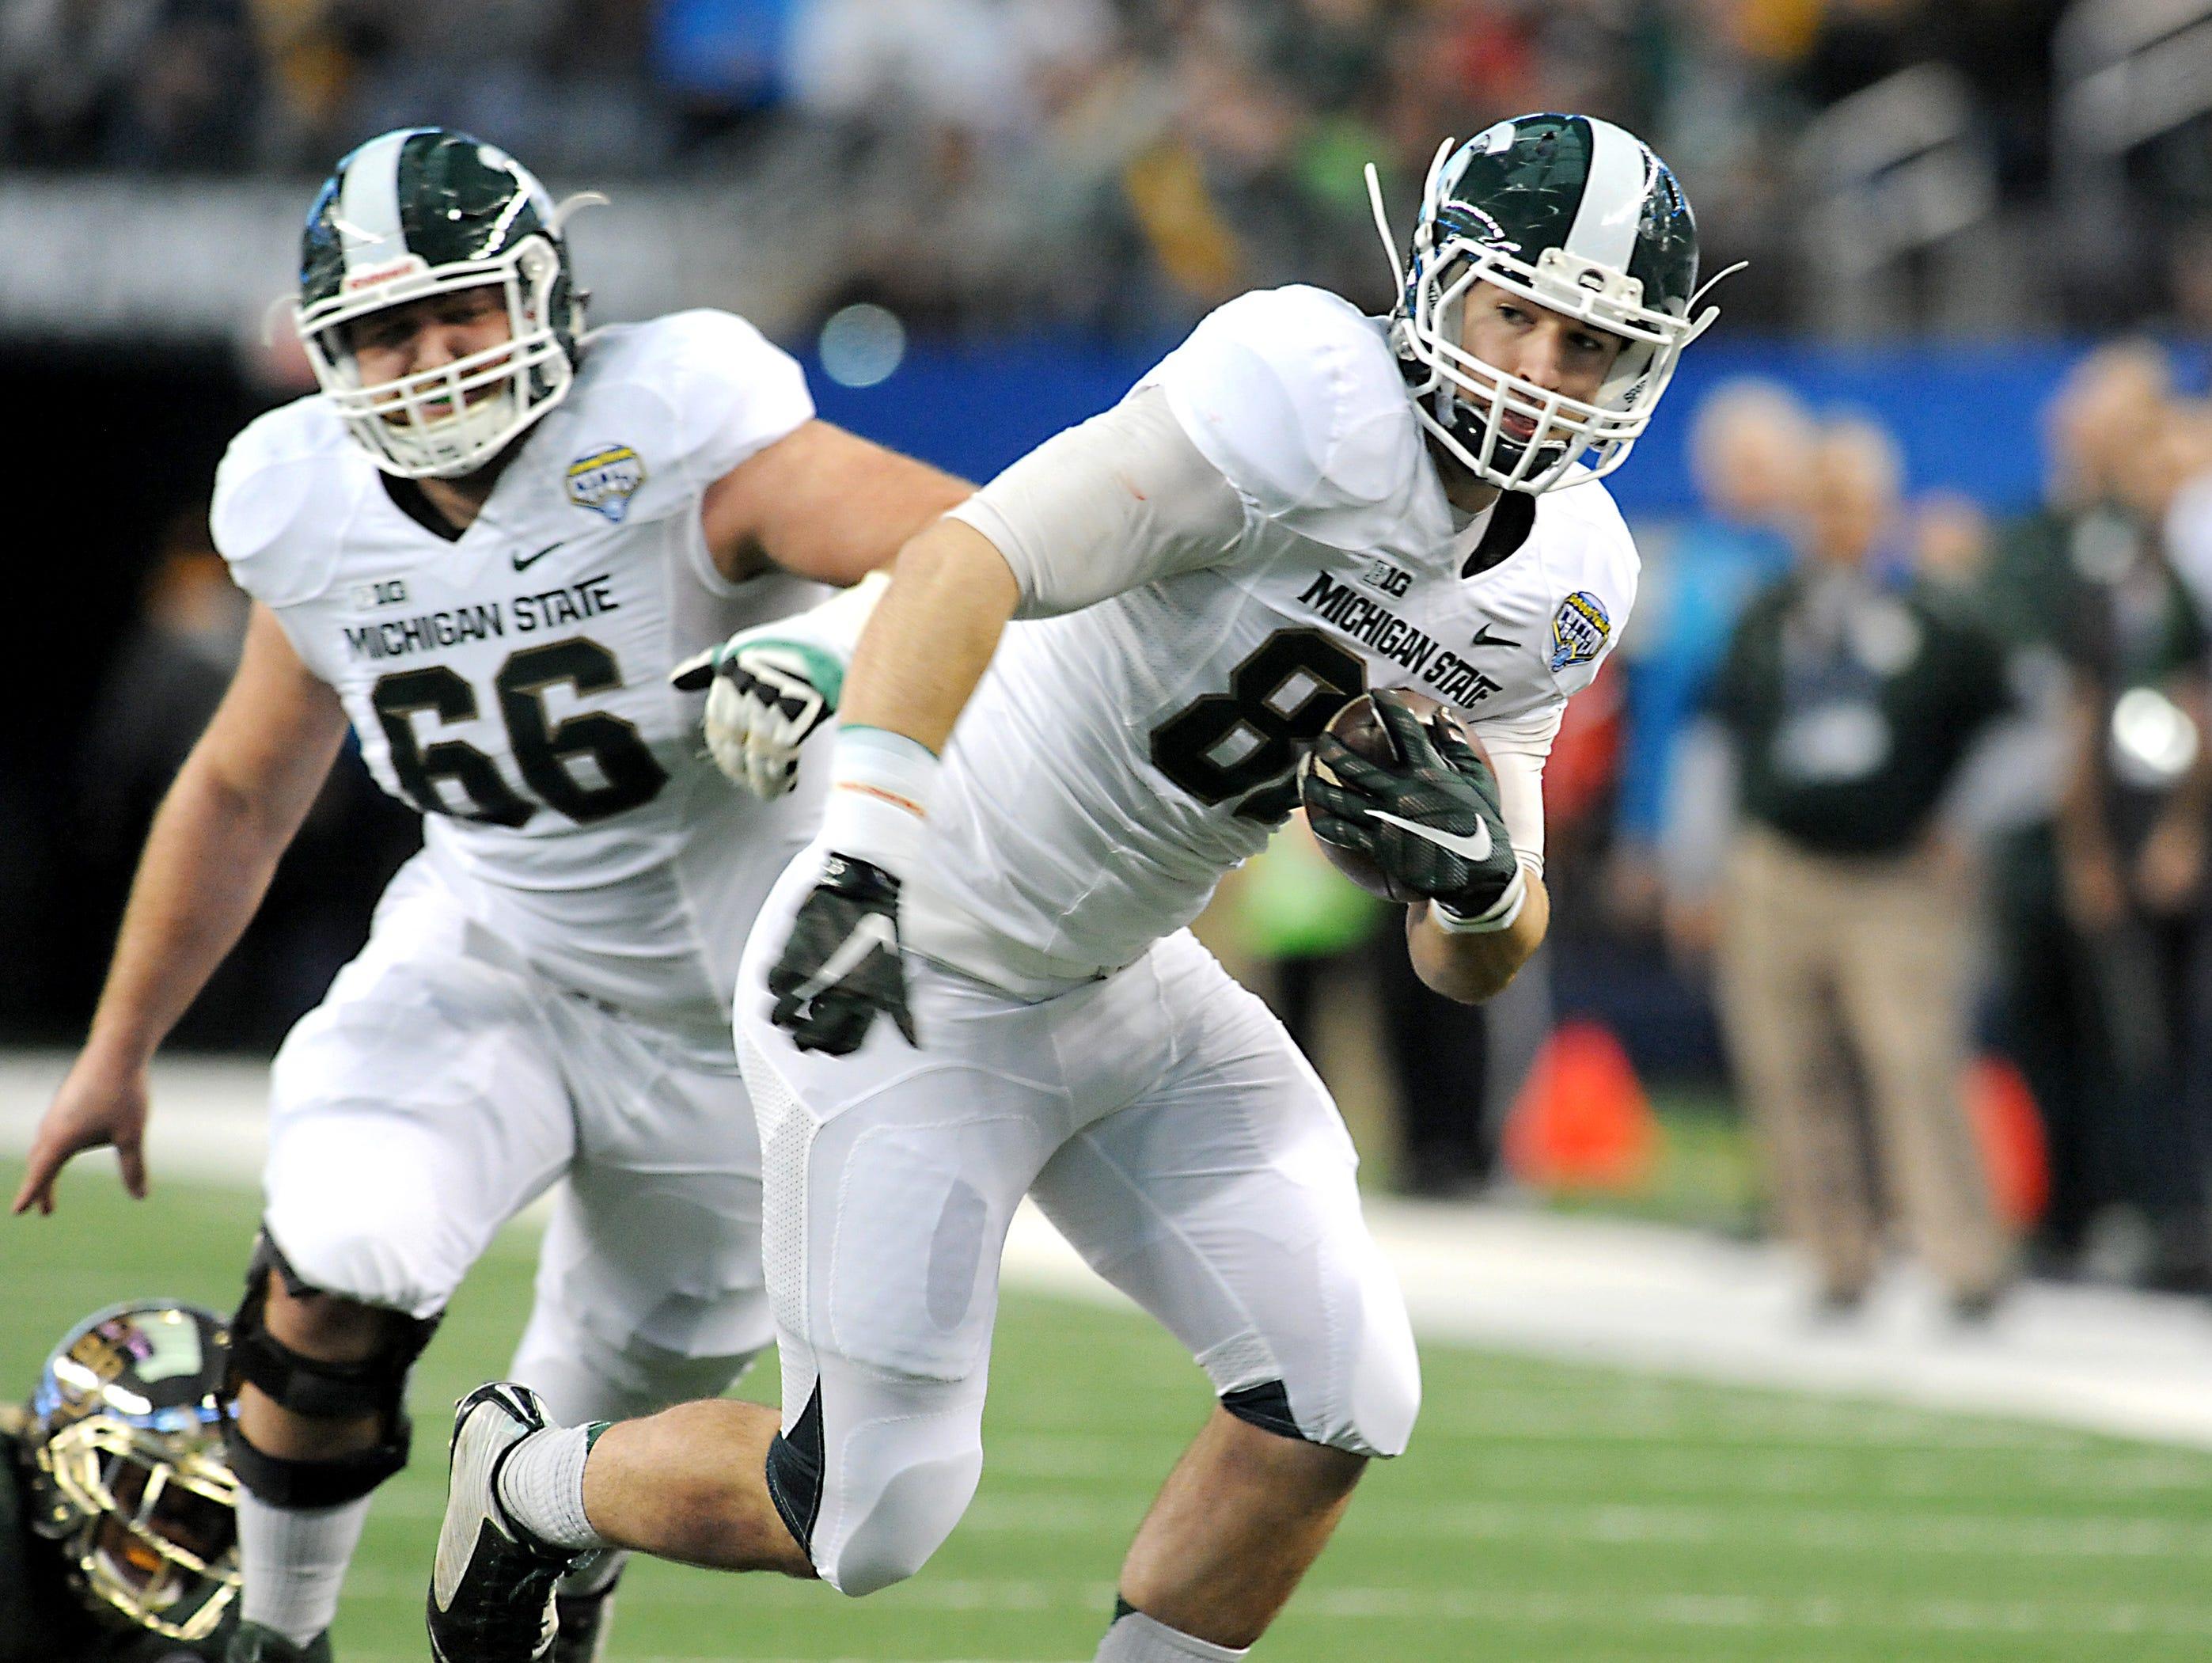 Michigan State tight end Josiah Price